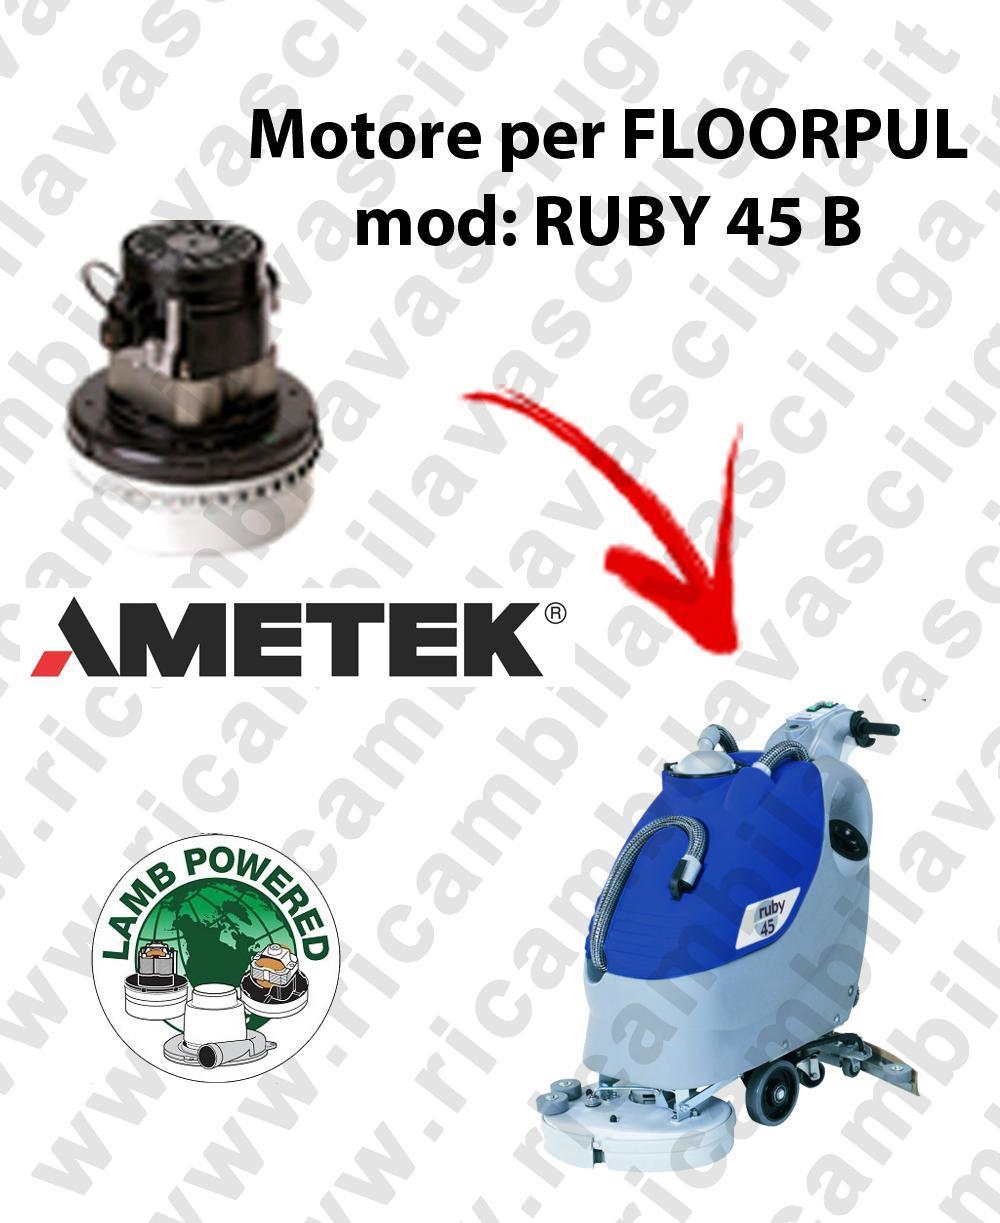 RUBY 45 B Motore de aspiración LAMB AMETEK para fregadora FLOORPUL